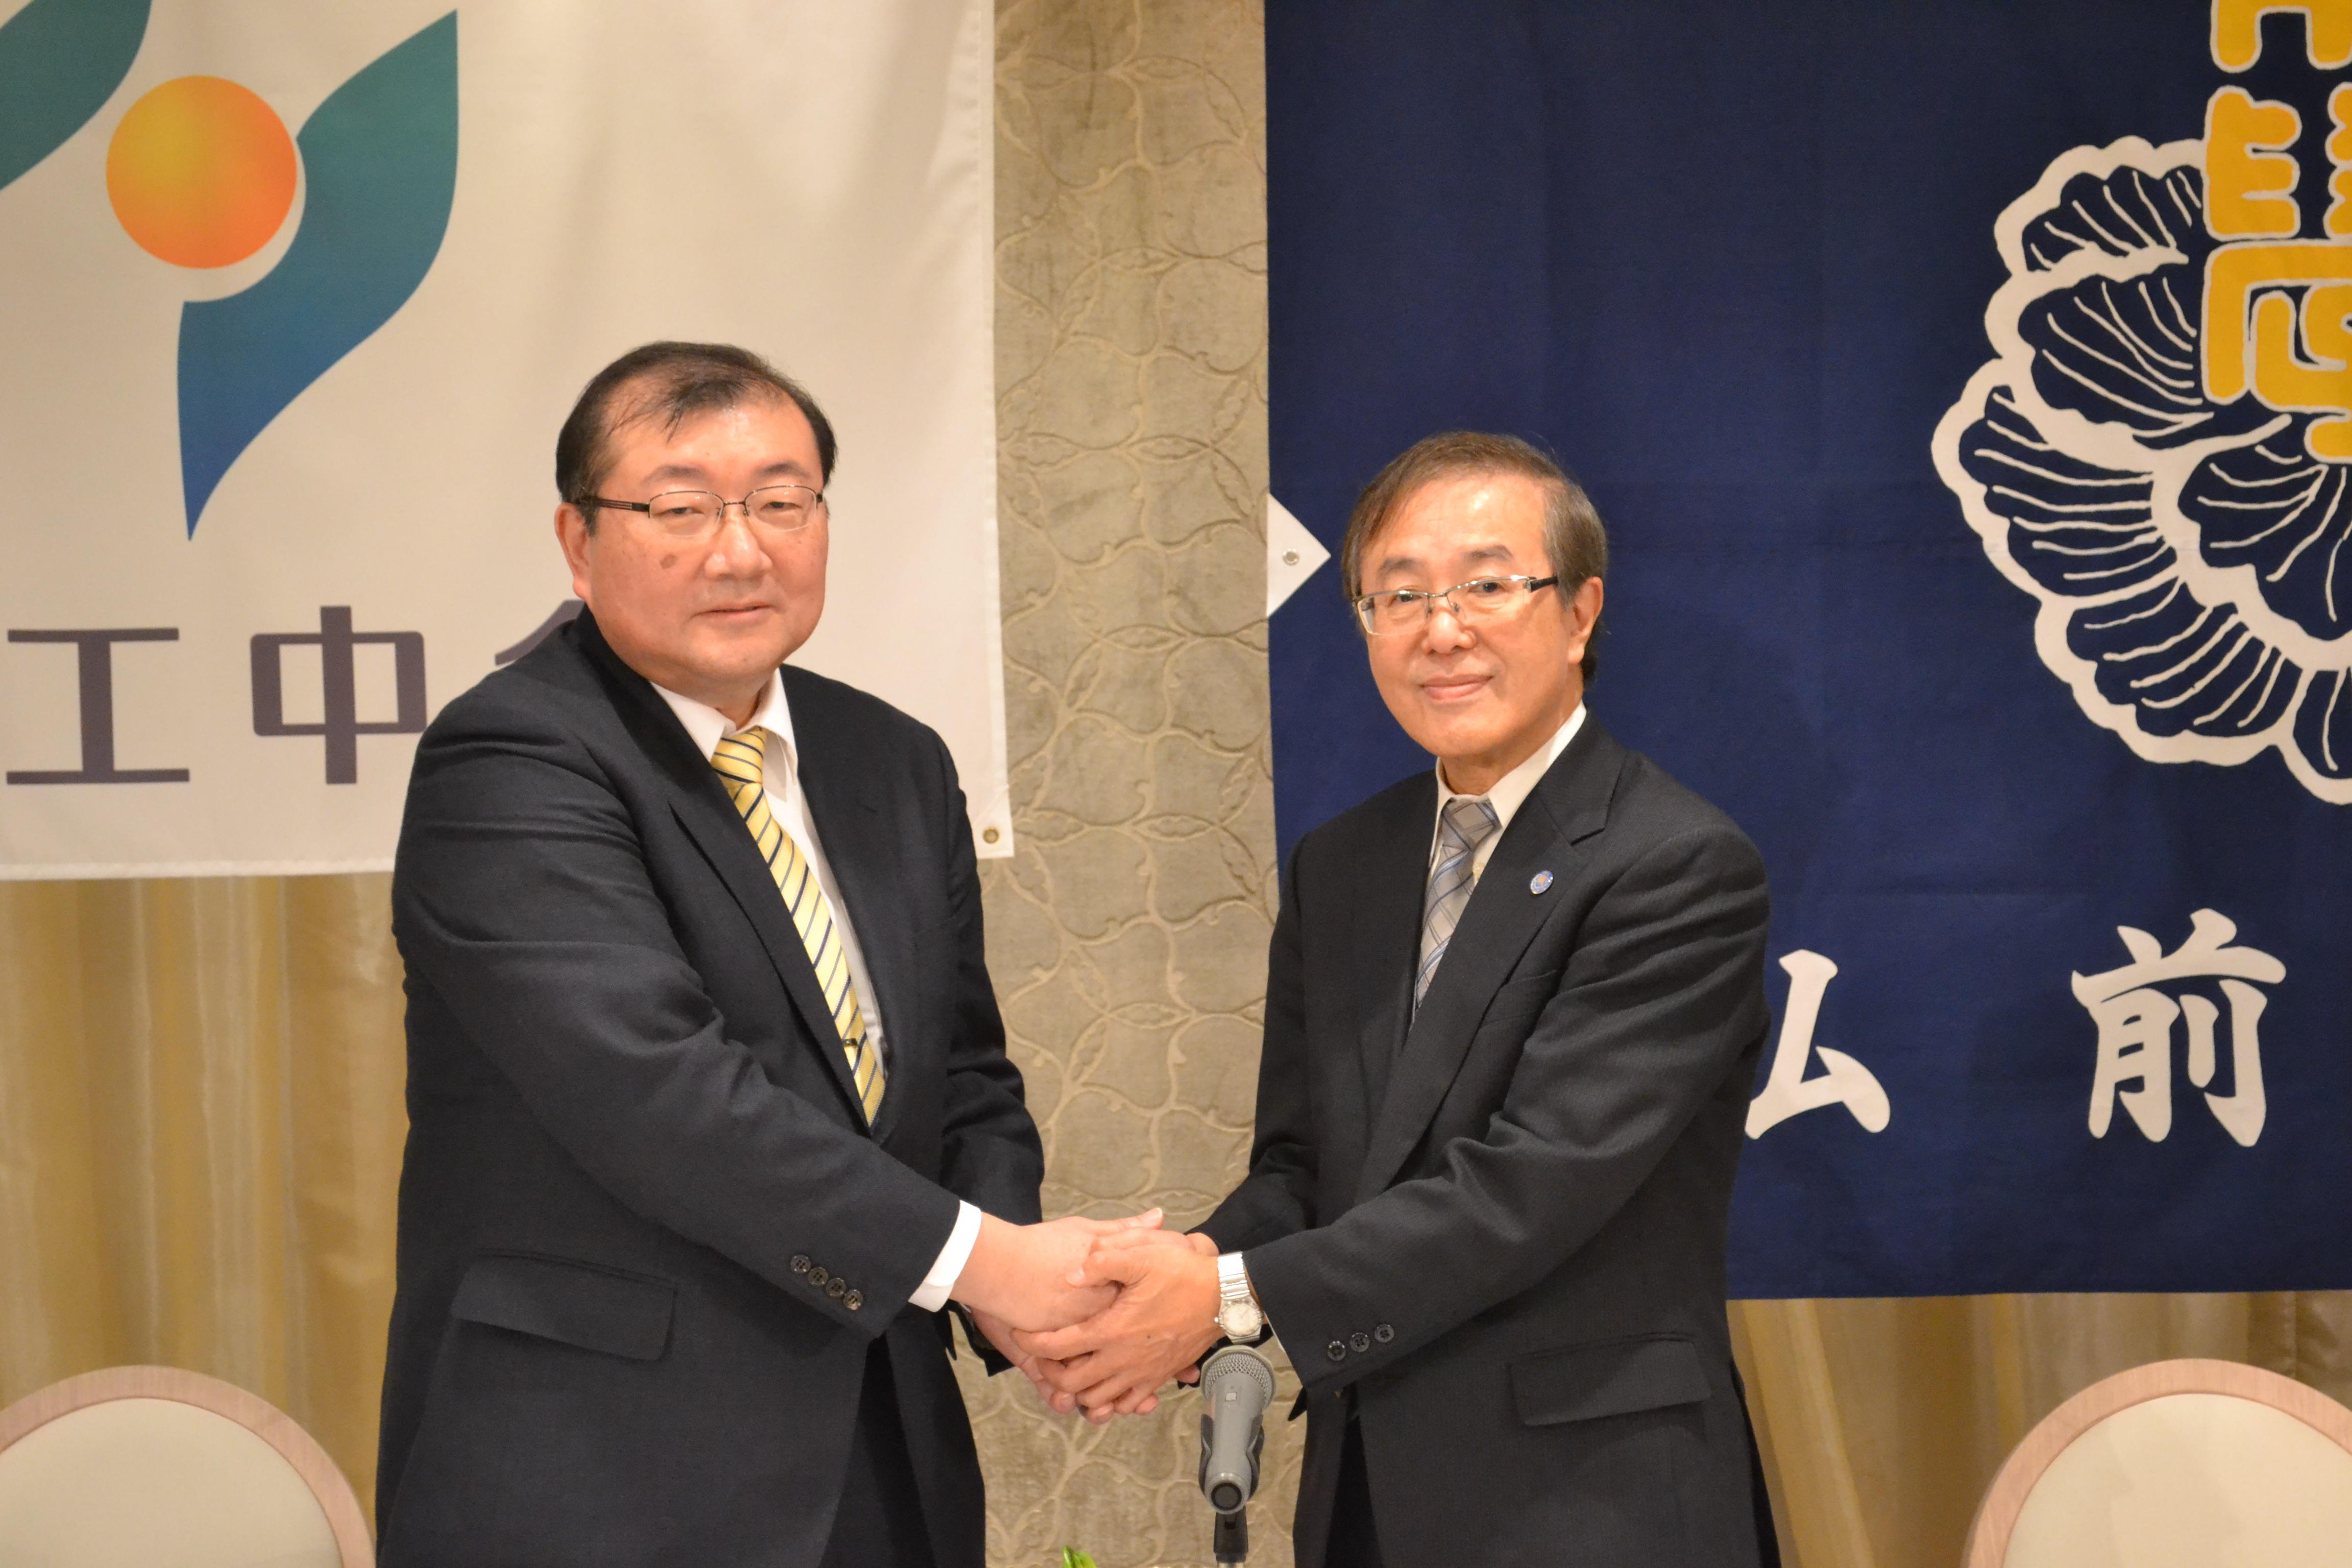 握手する河野取締役兼常務執行役員(左)と佐藤学長(右)